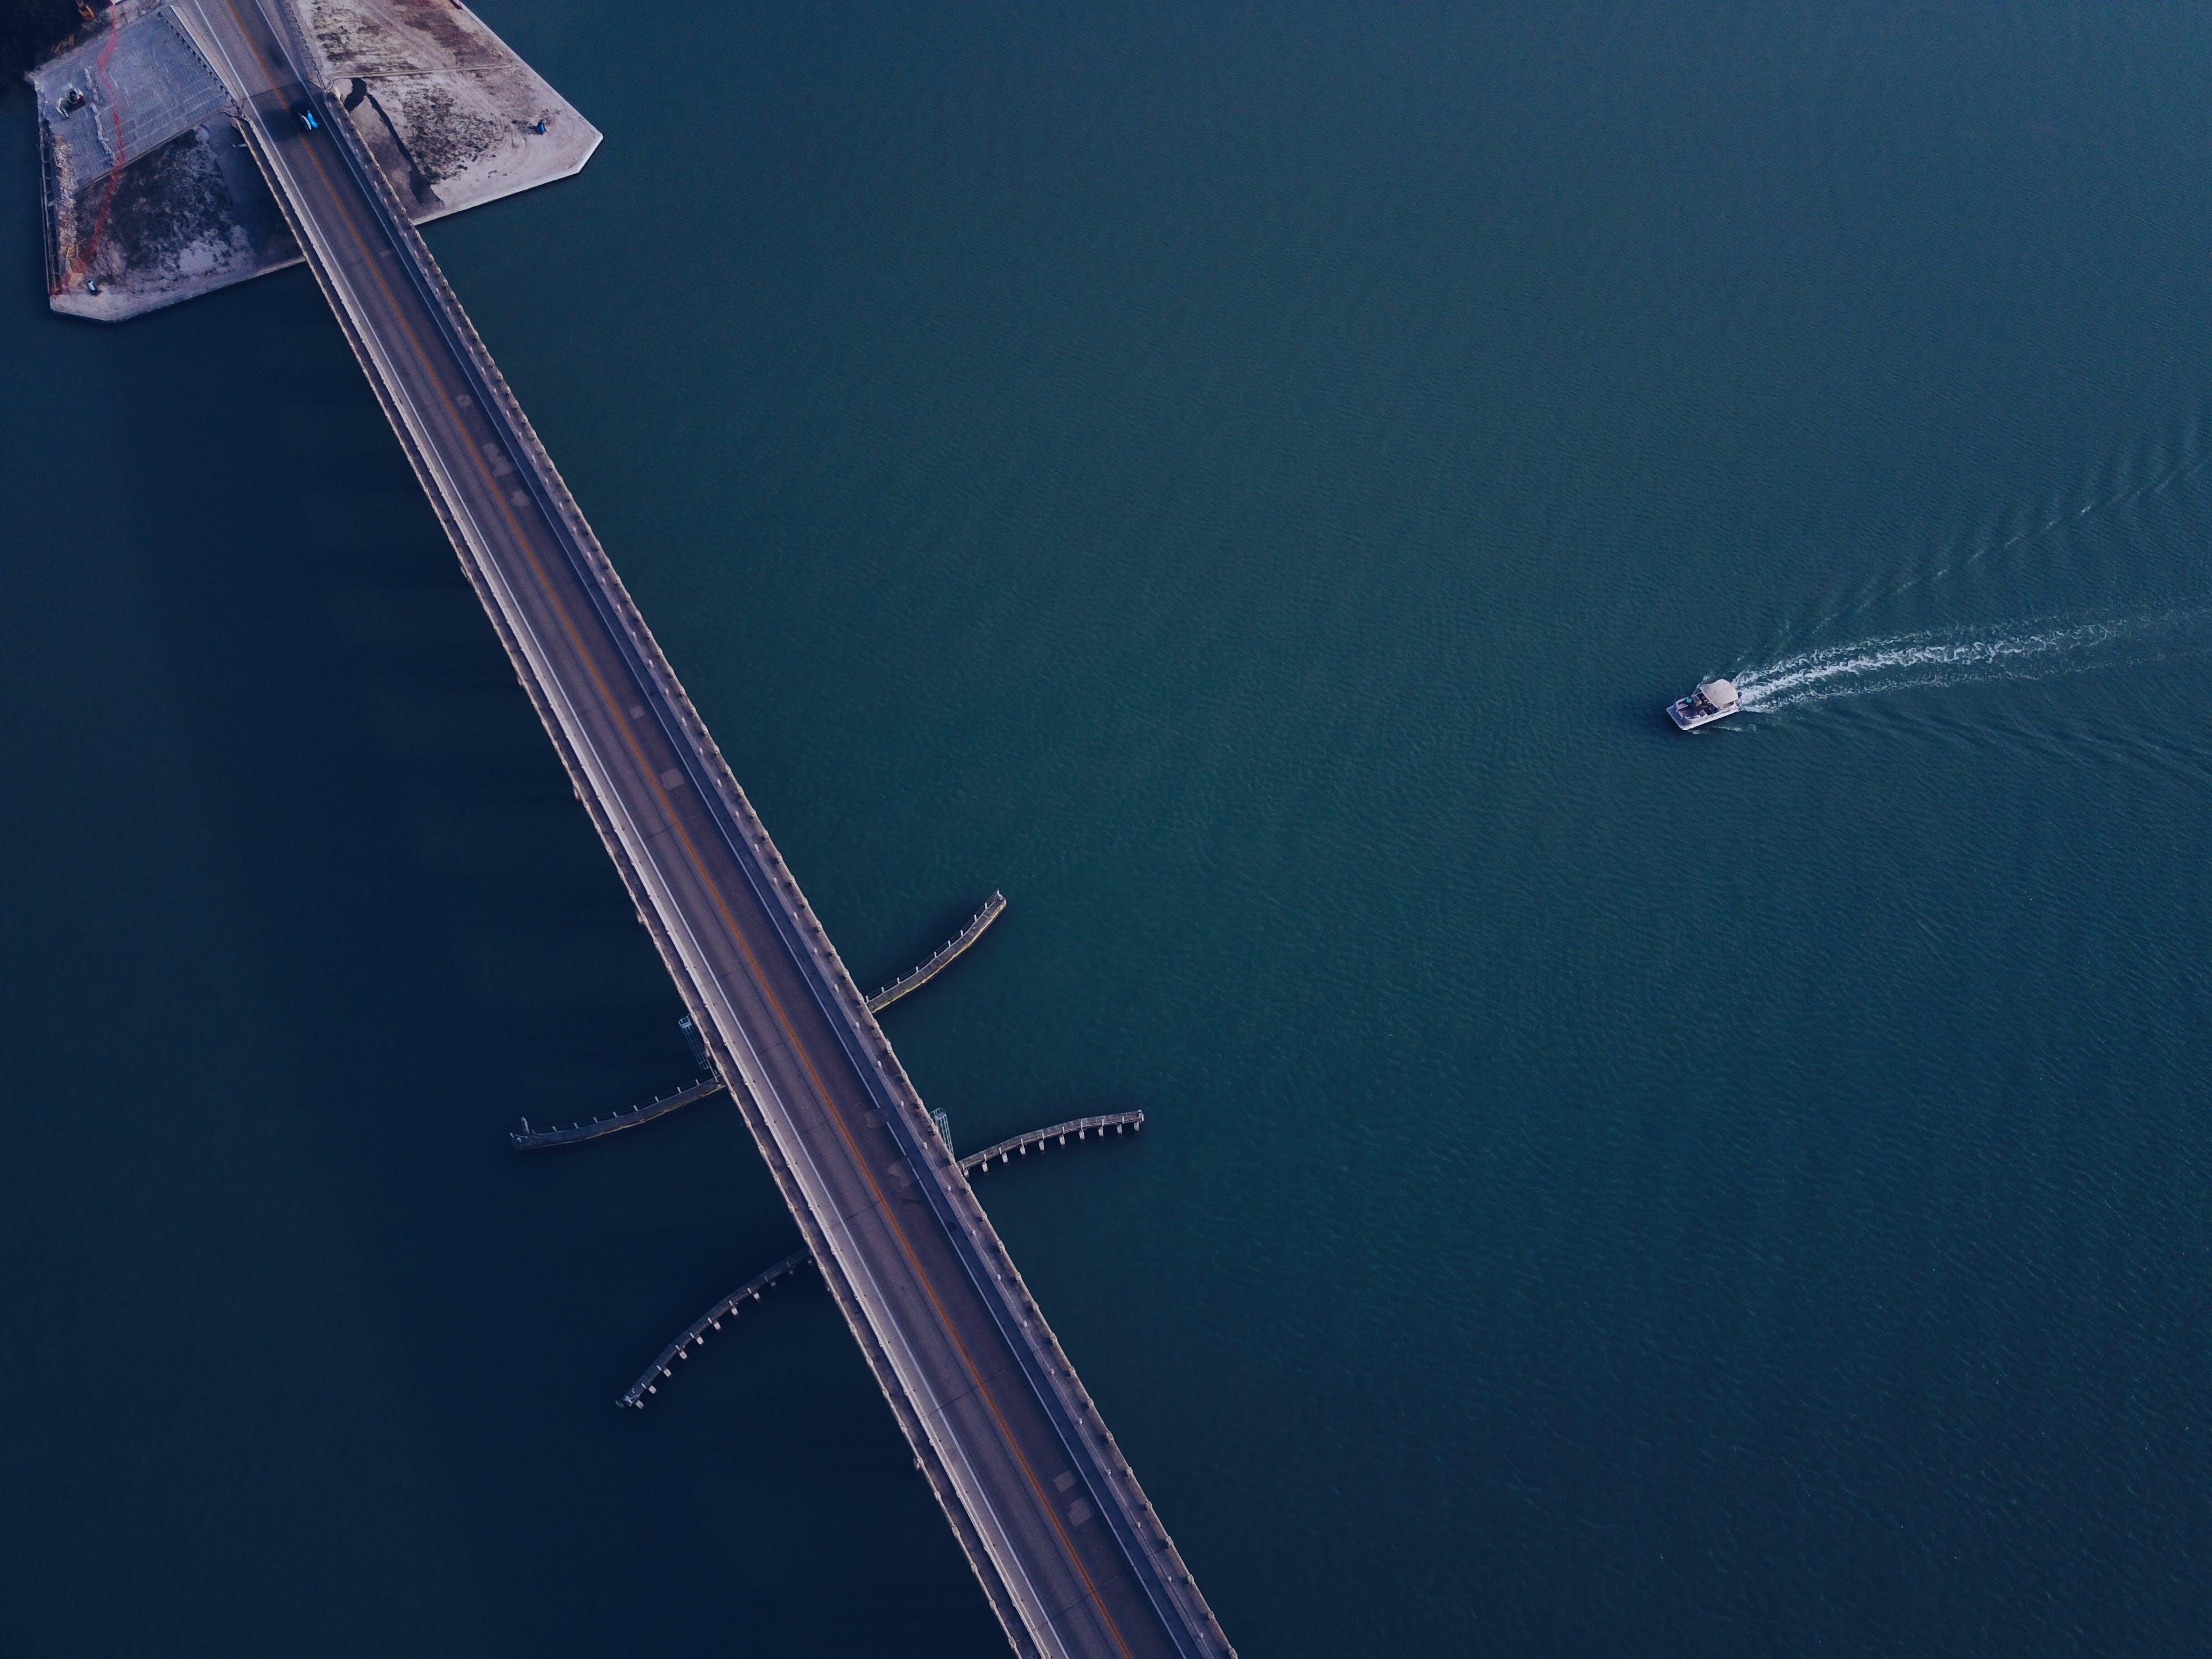 Free stock photo of sea, water, bridge, waves